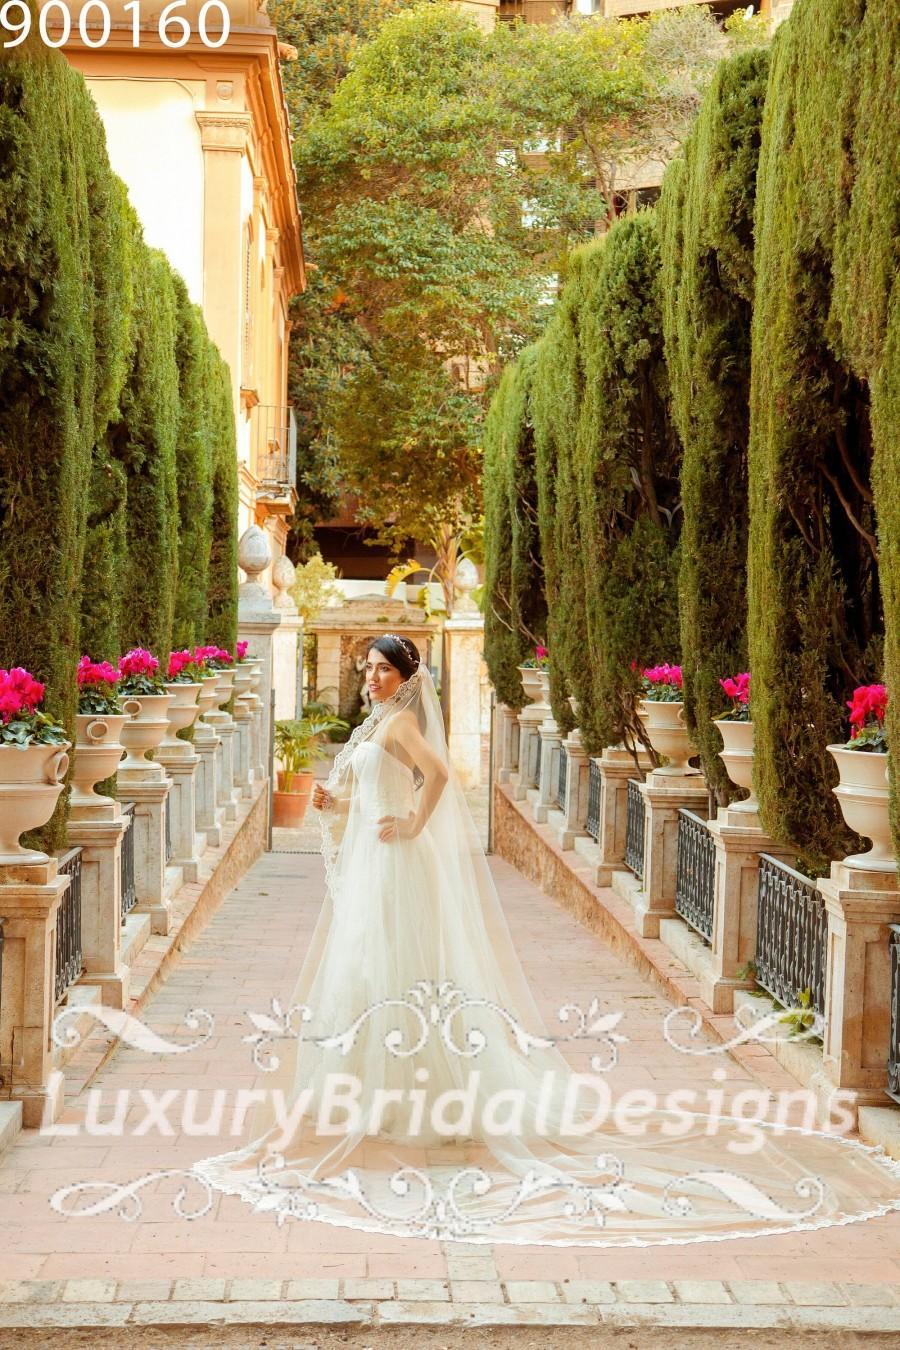 Wedding - 3X3 M , Cathedral Wedding Veil Mantilla Lace Wedding Veil Bridal Veil Ivory Veil  Crystal Pearl Sequins Alencon Lace Drop Veil  Vintage Veil